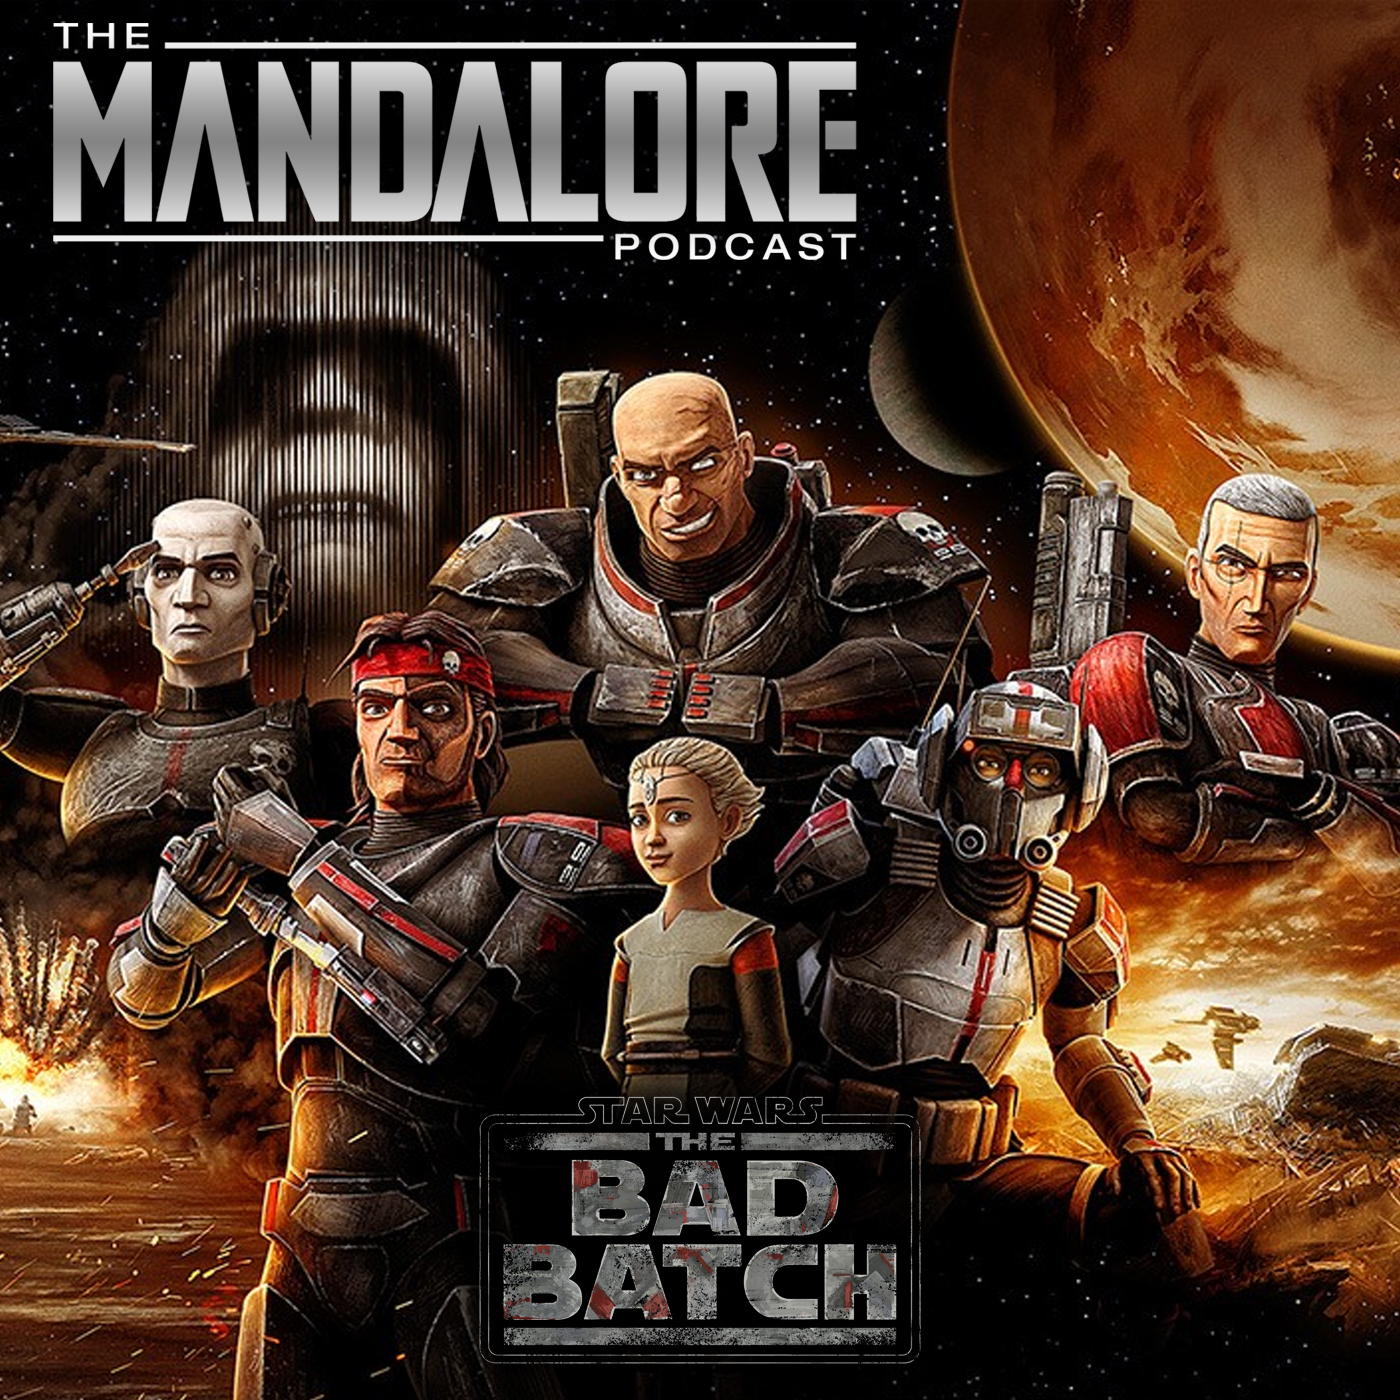 The Bad Batch - S1E11 - Devil's Deal